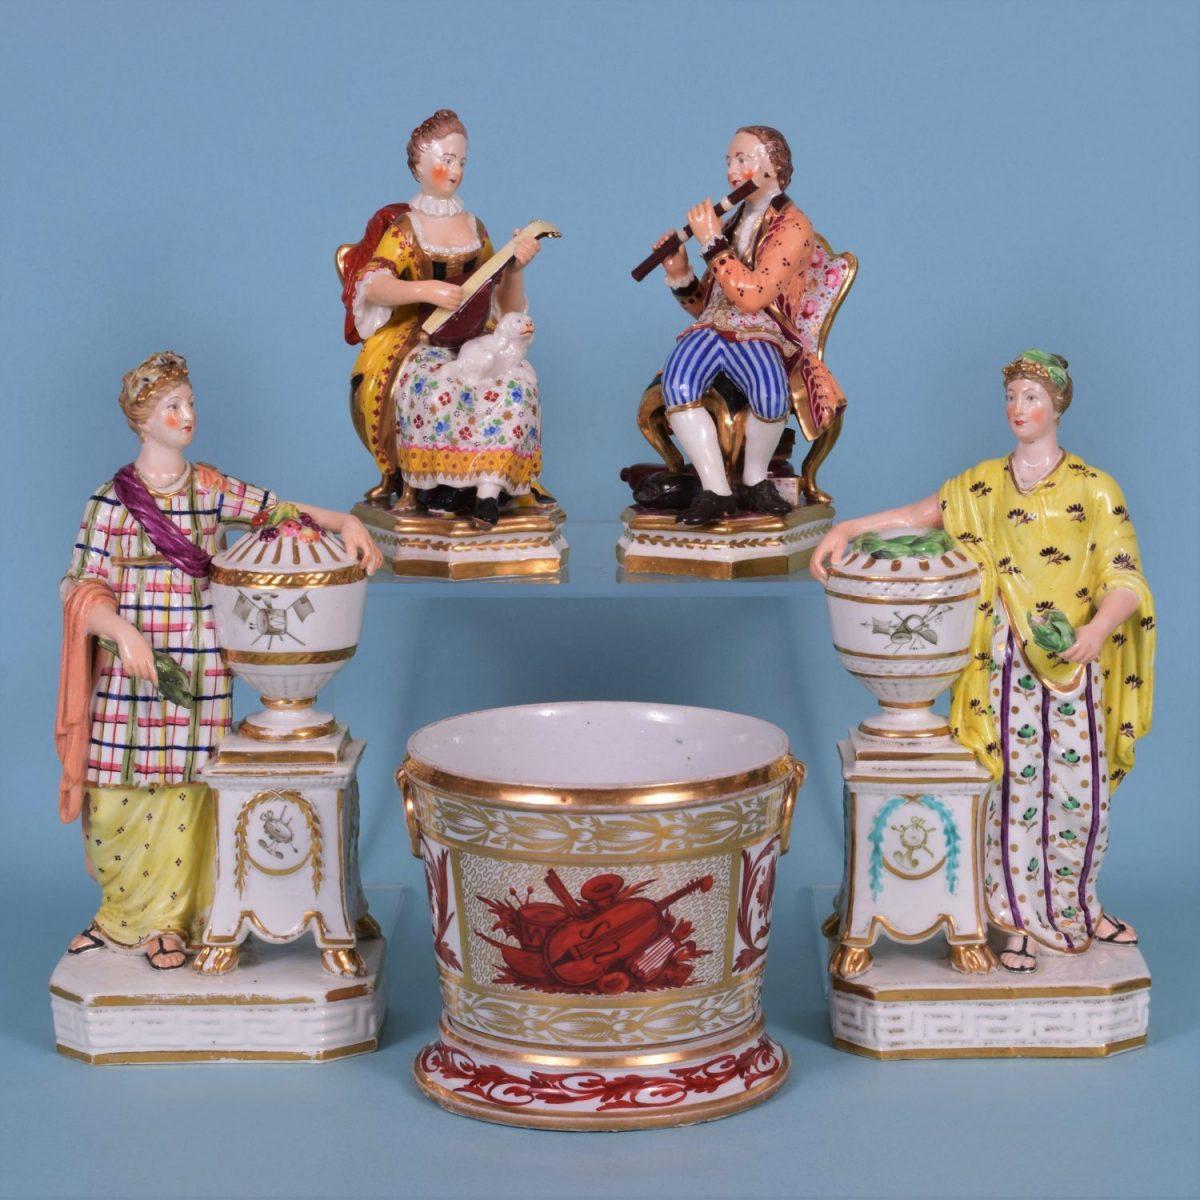 16. English Porcelain